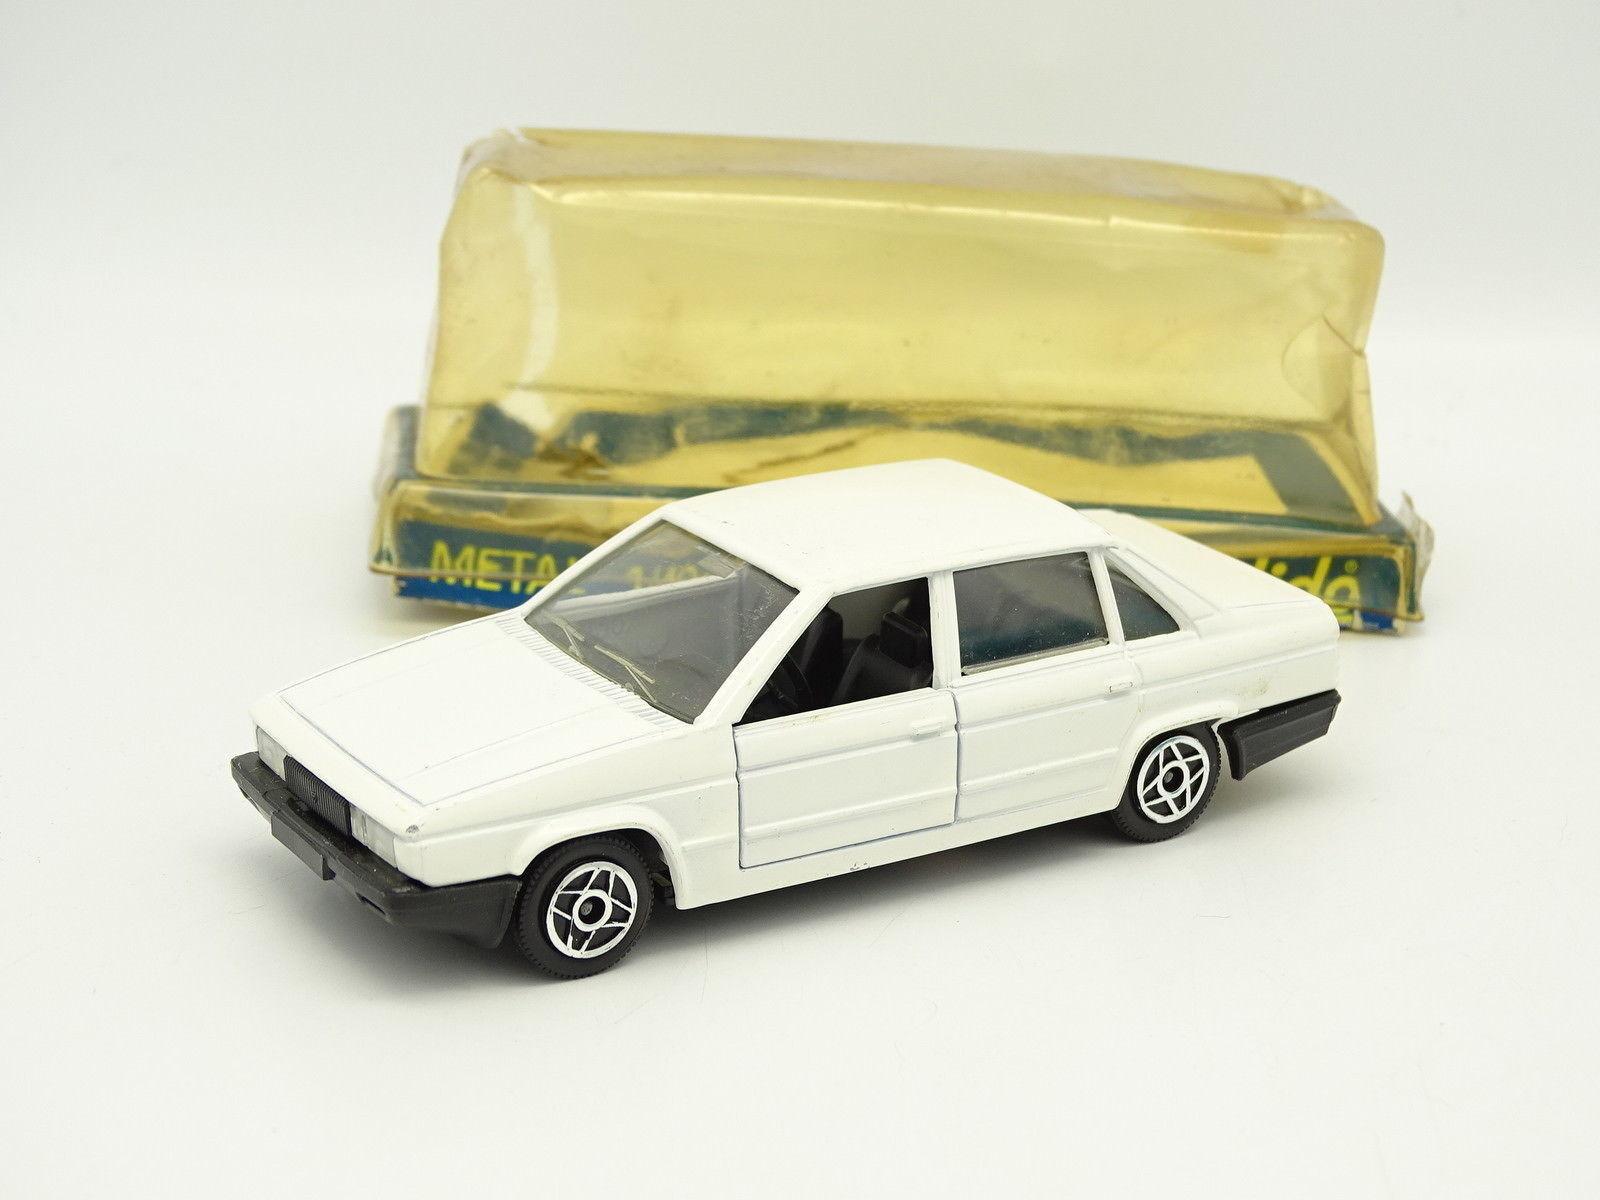 Solido 1 1 1 43 - Talbot Tagora Bianco 1307 5d794d